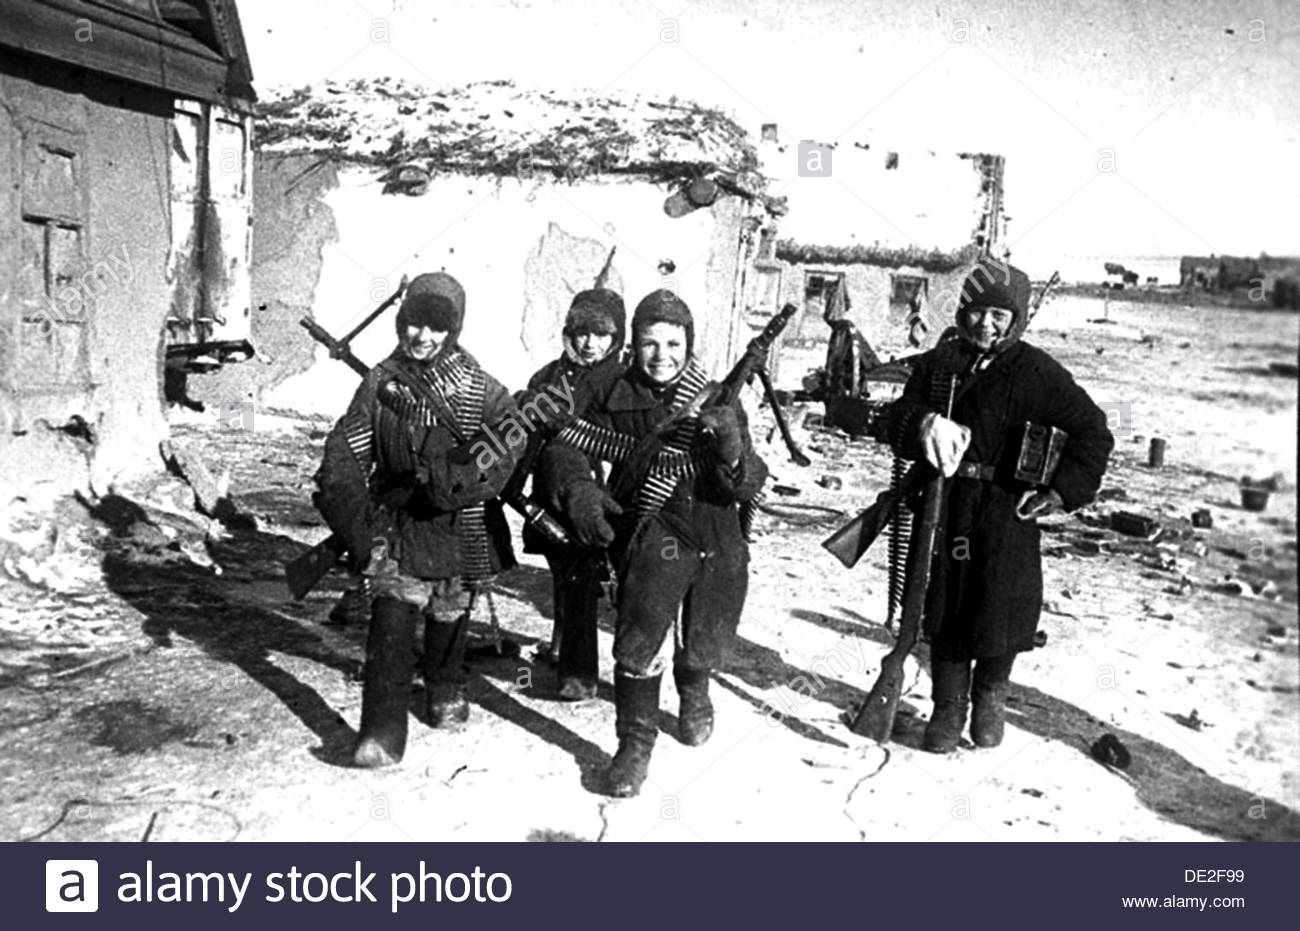 Child soldiers in the Stalingrad region, USSR, World War II, 1943. Artist: Anon - Stock Image